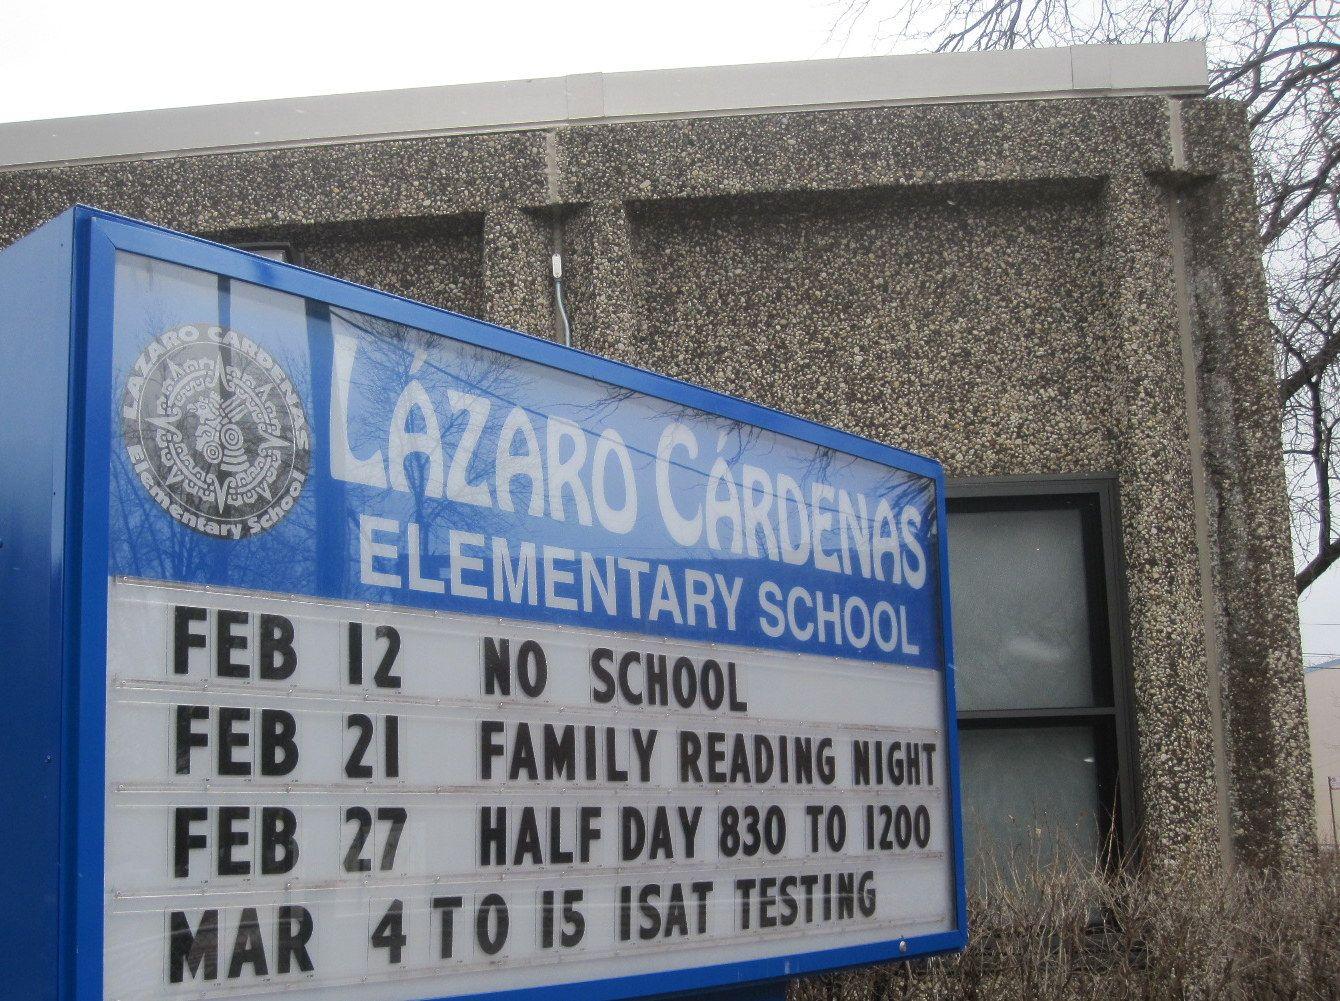 featured image Lazaro Cardenas Elementary School